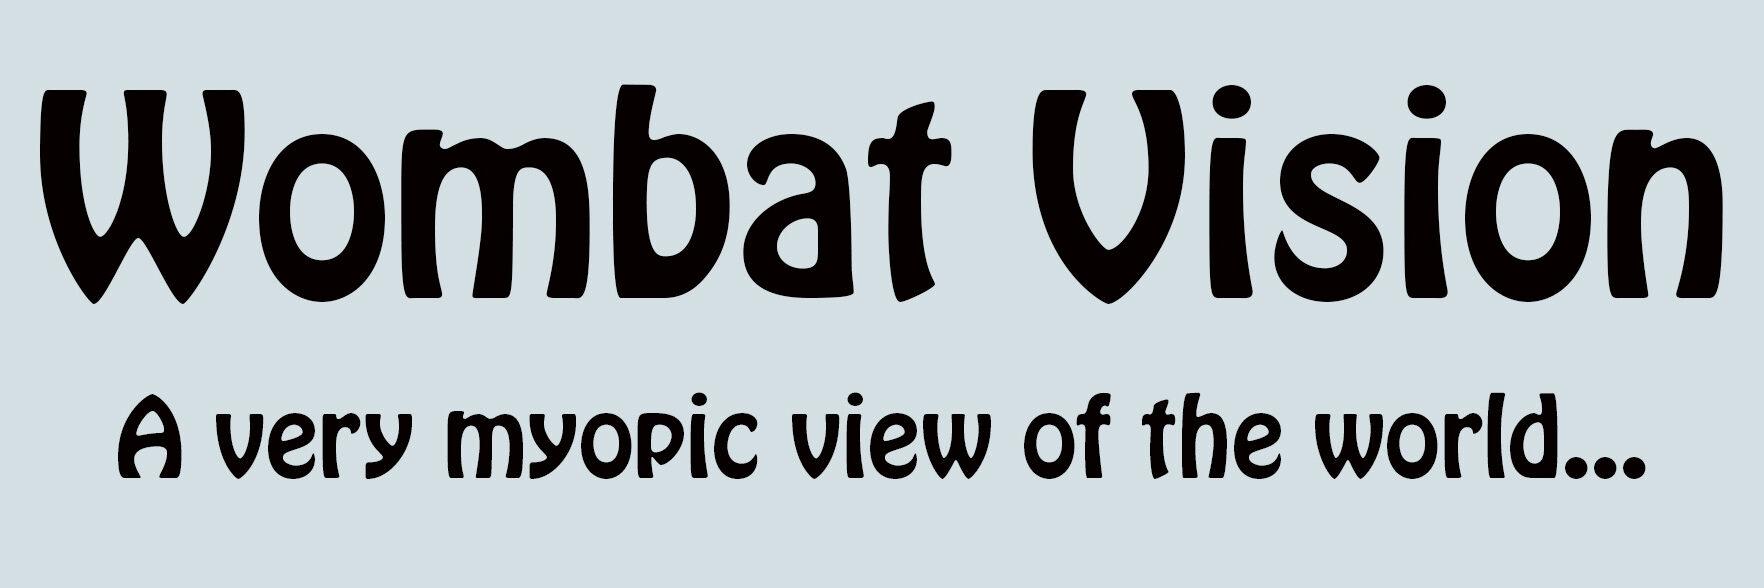 Wombat Vision: